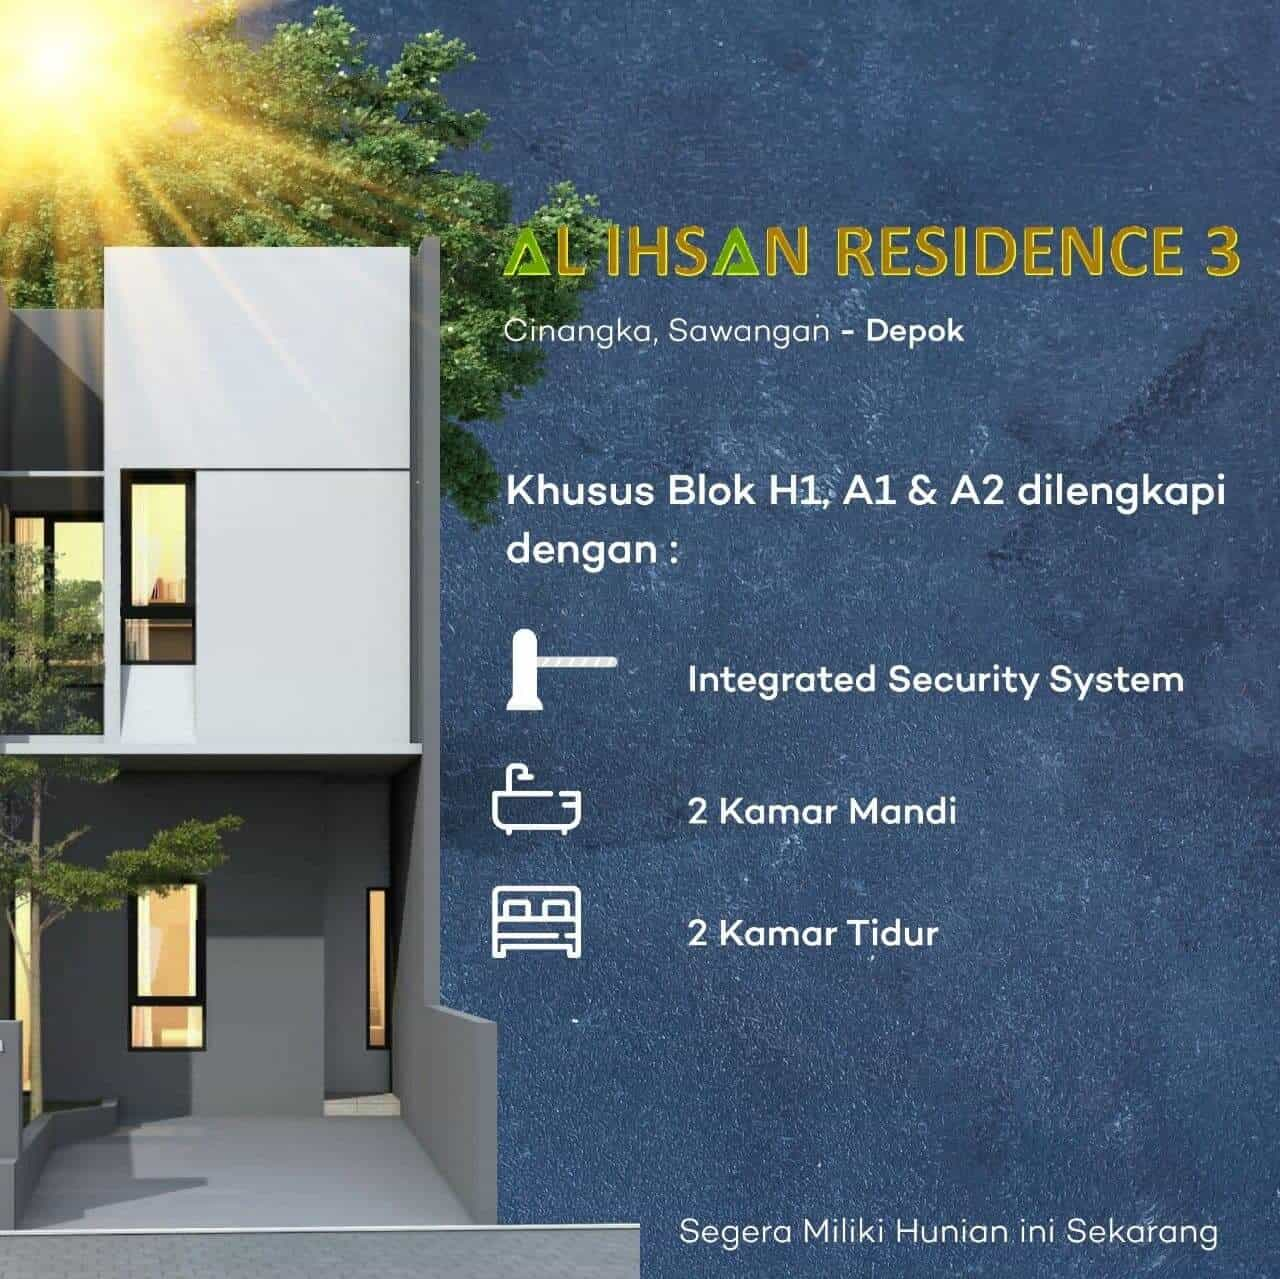 perumahan-syariah-depok-perumahan-islami-depok-kpr-syariah-depok-siteplan-al-ihsan-residence-3-dav-property-syariah (8)